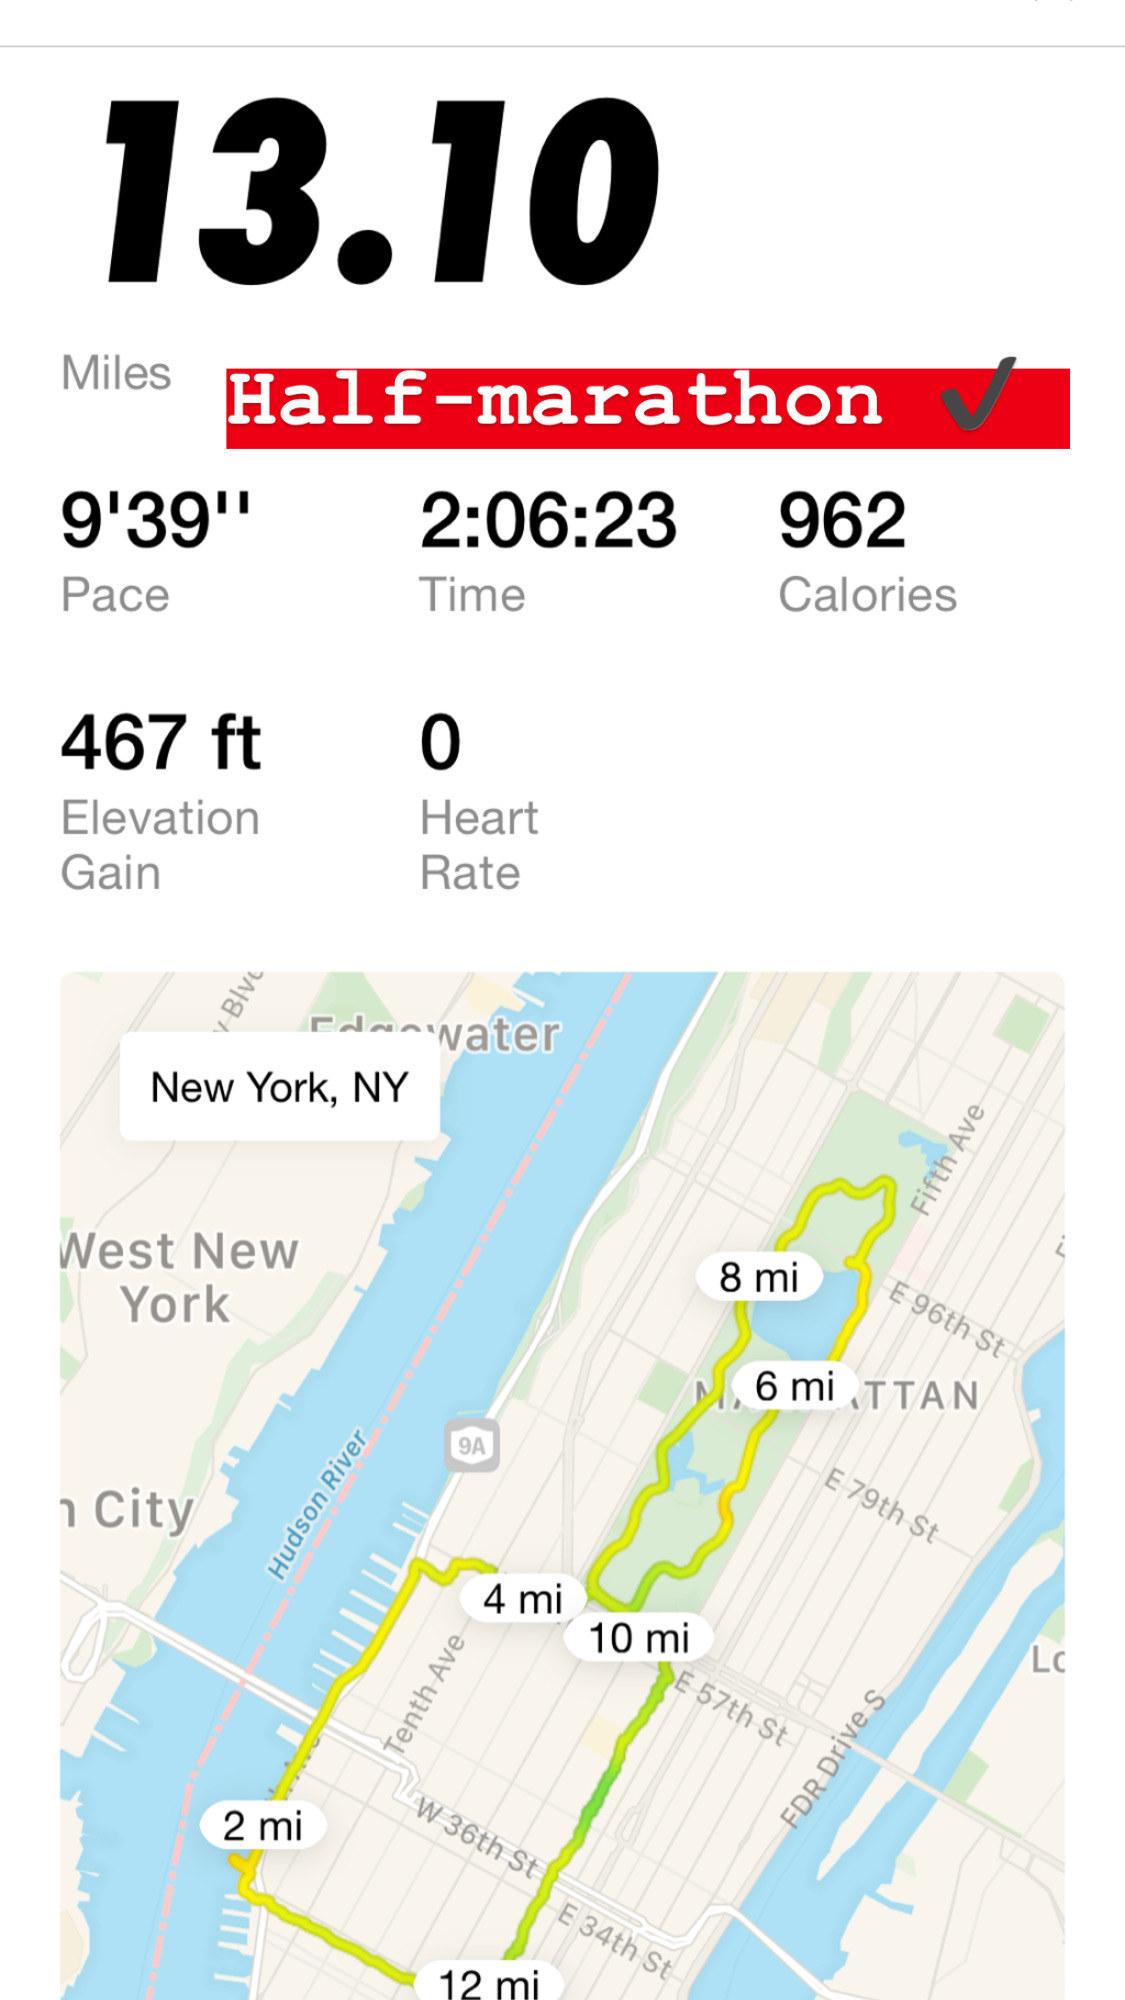 A screenshot from the Nike Run Club app, displaying 13.1 miles ran.